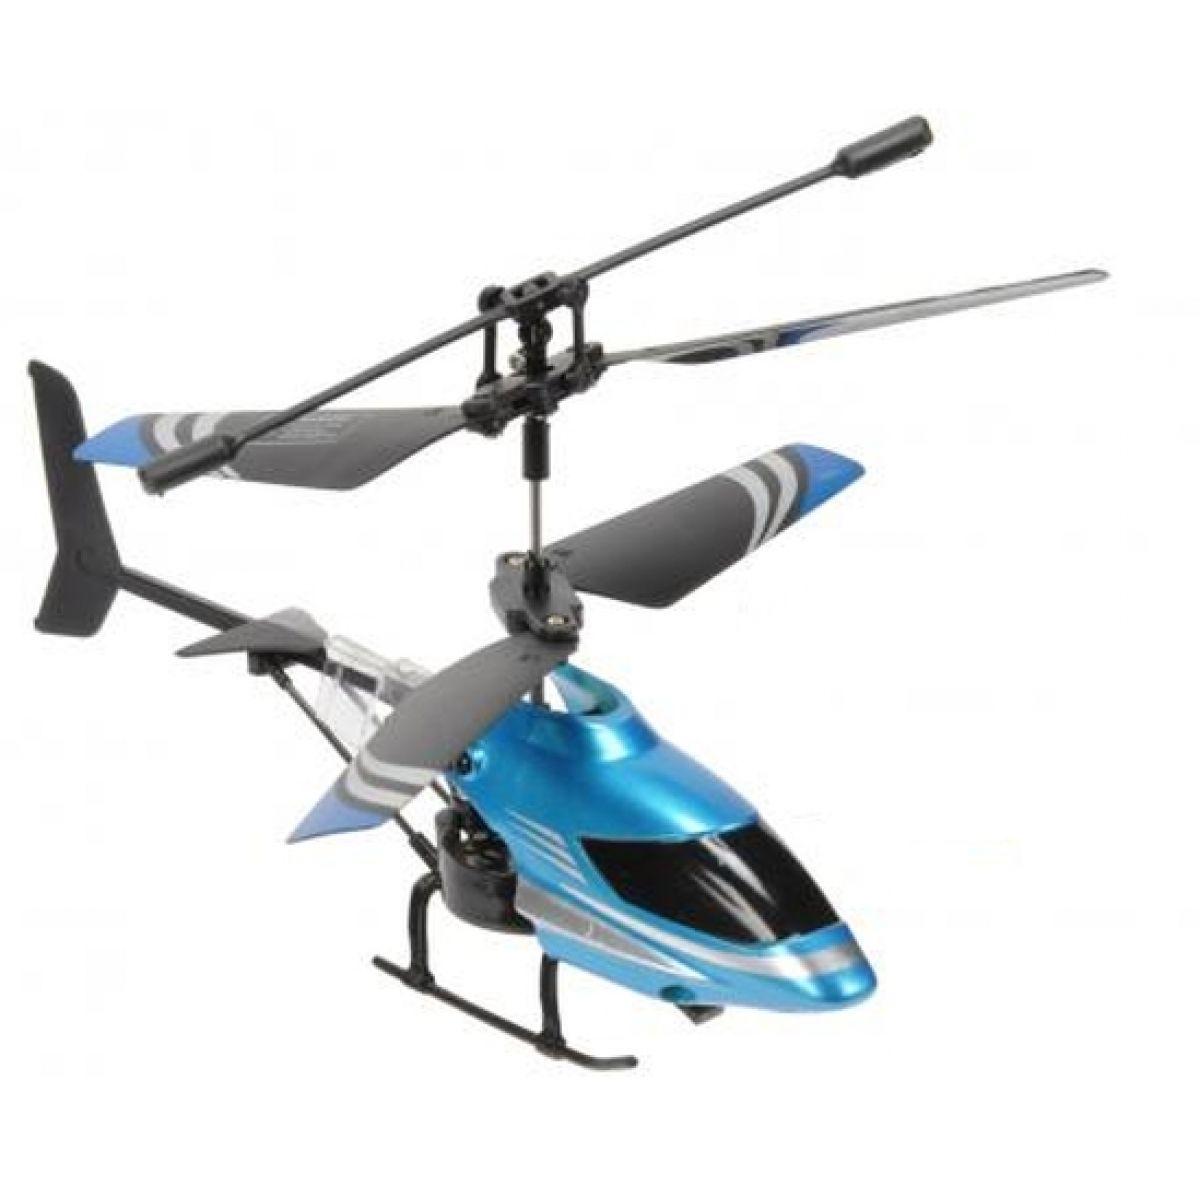 IC Vrtulník 18 cm